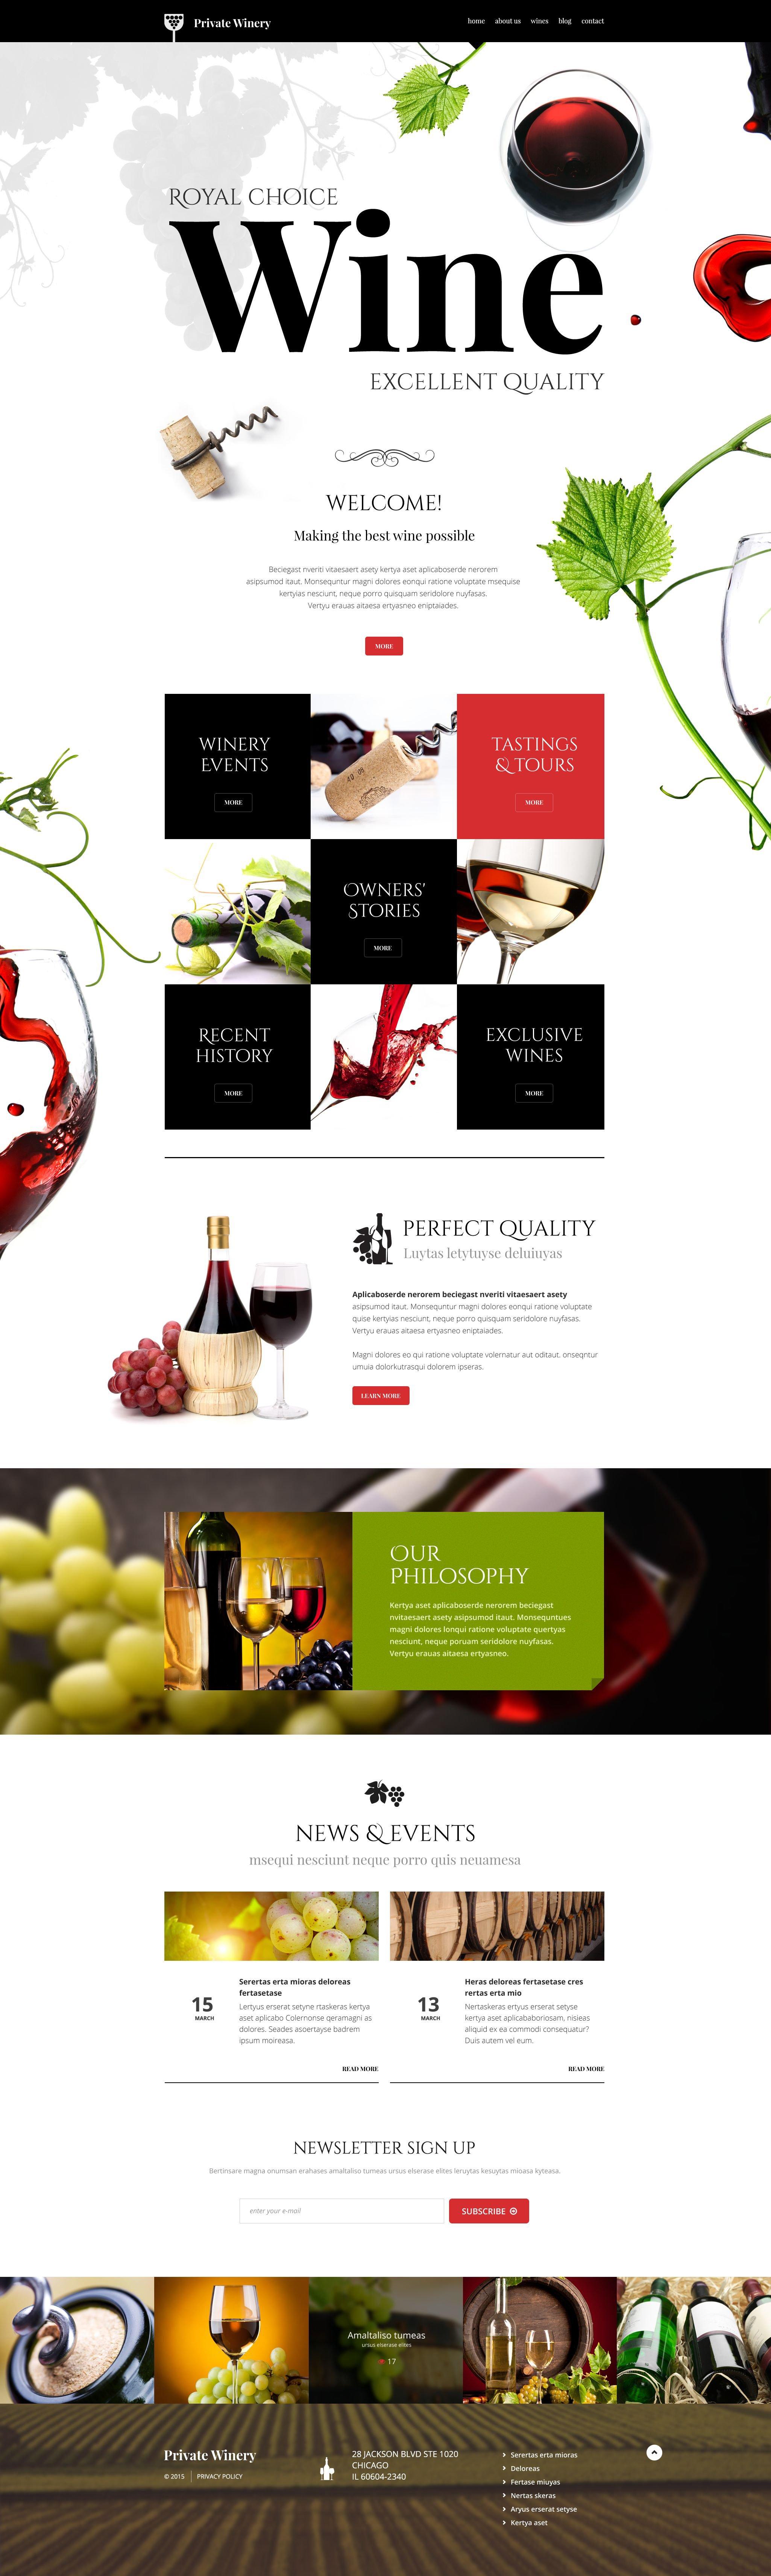 Reszponzív Private Winery WordPress sablon 54789